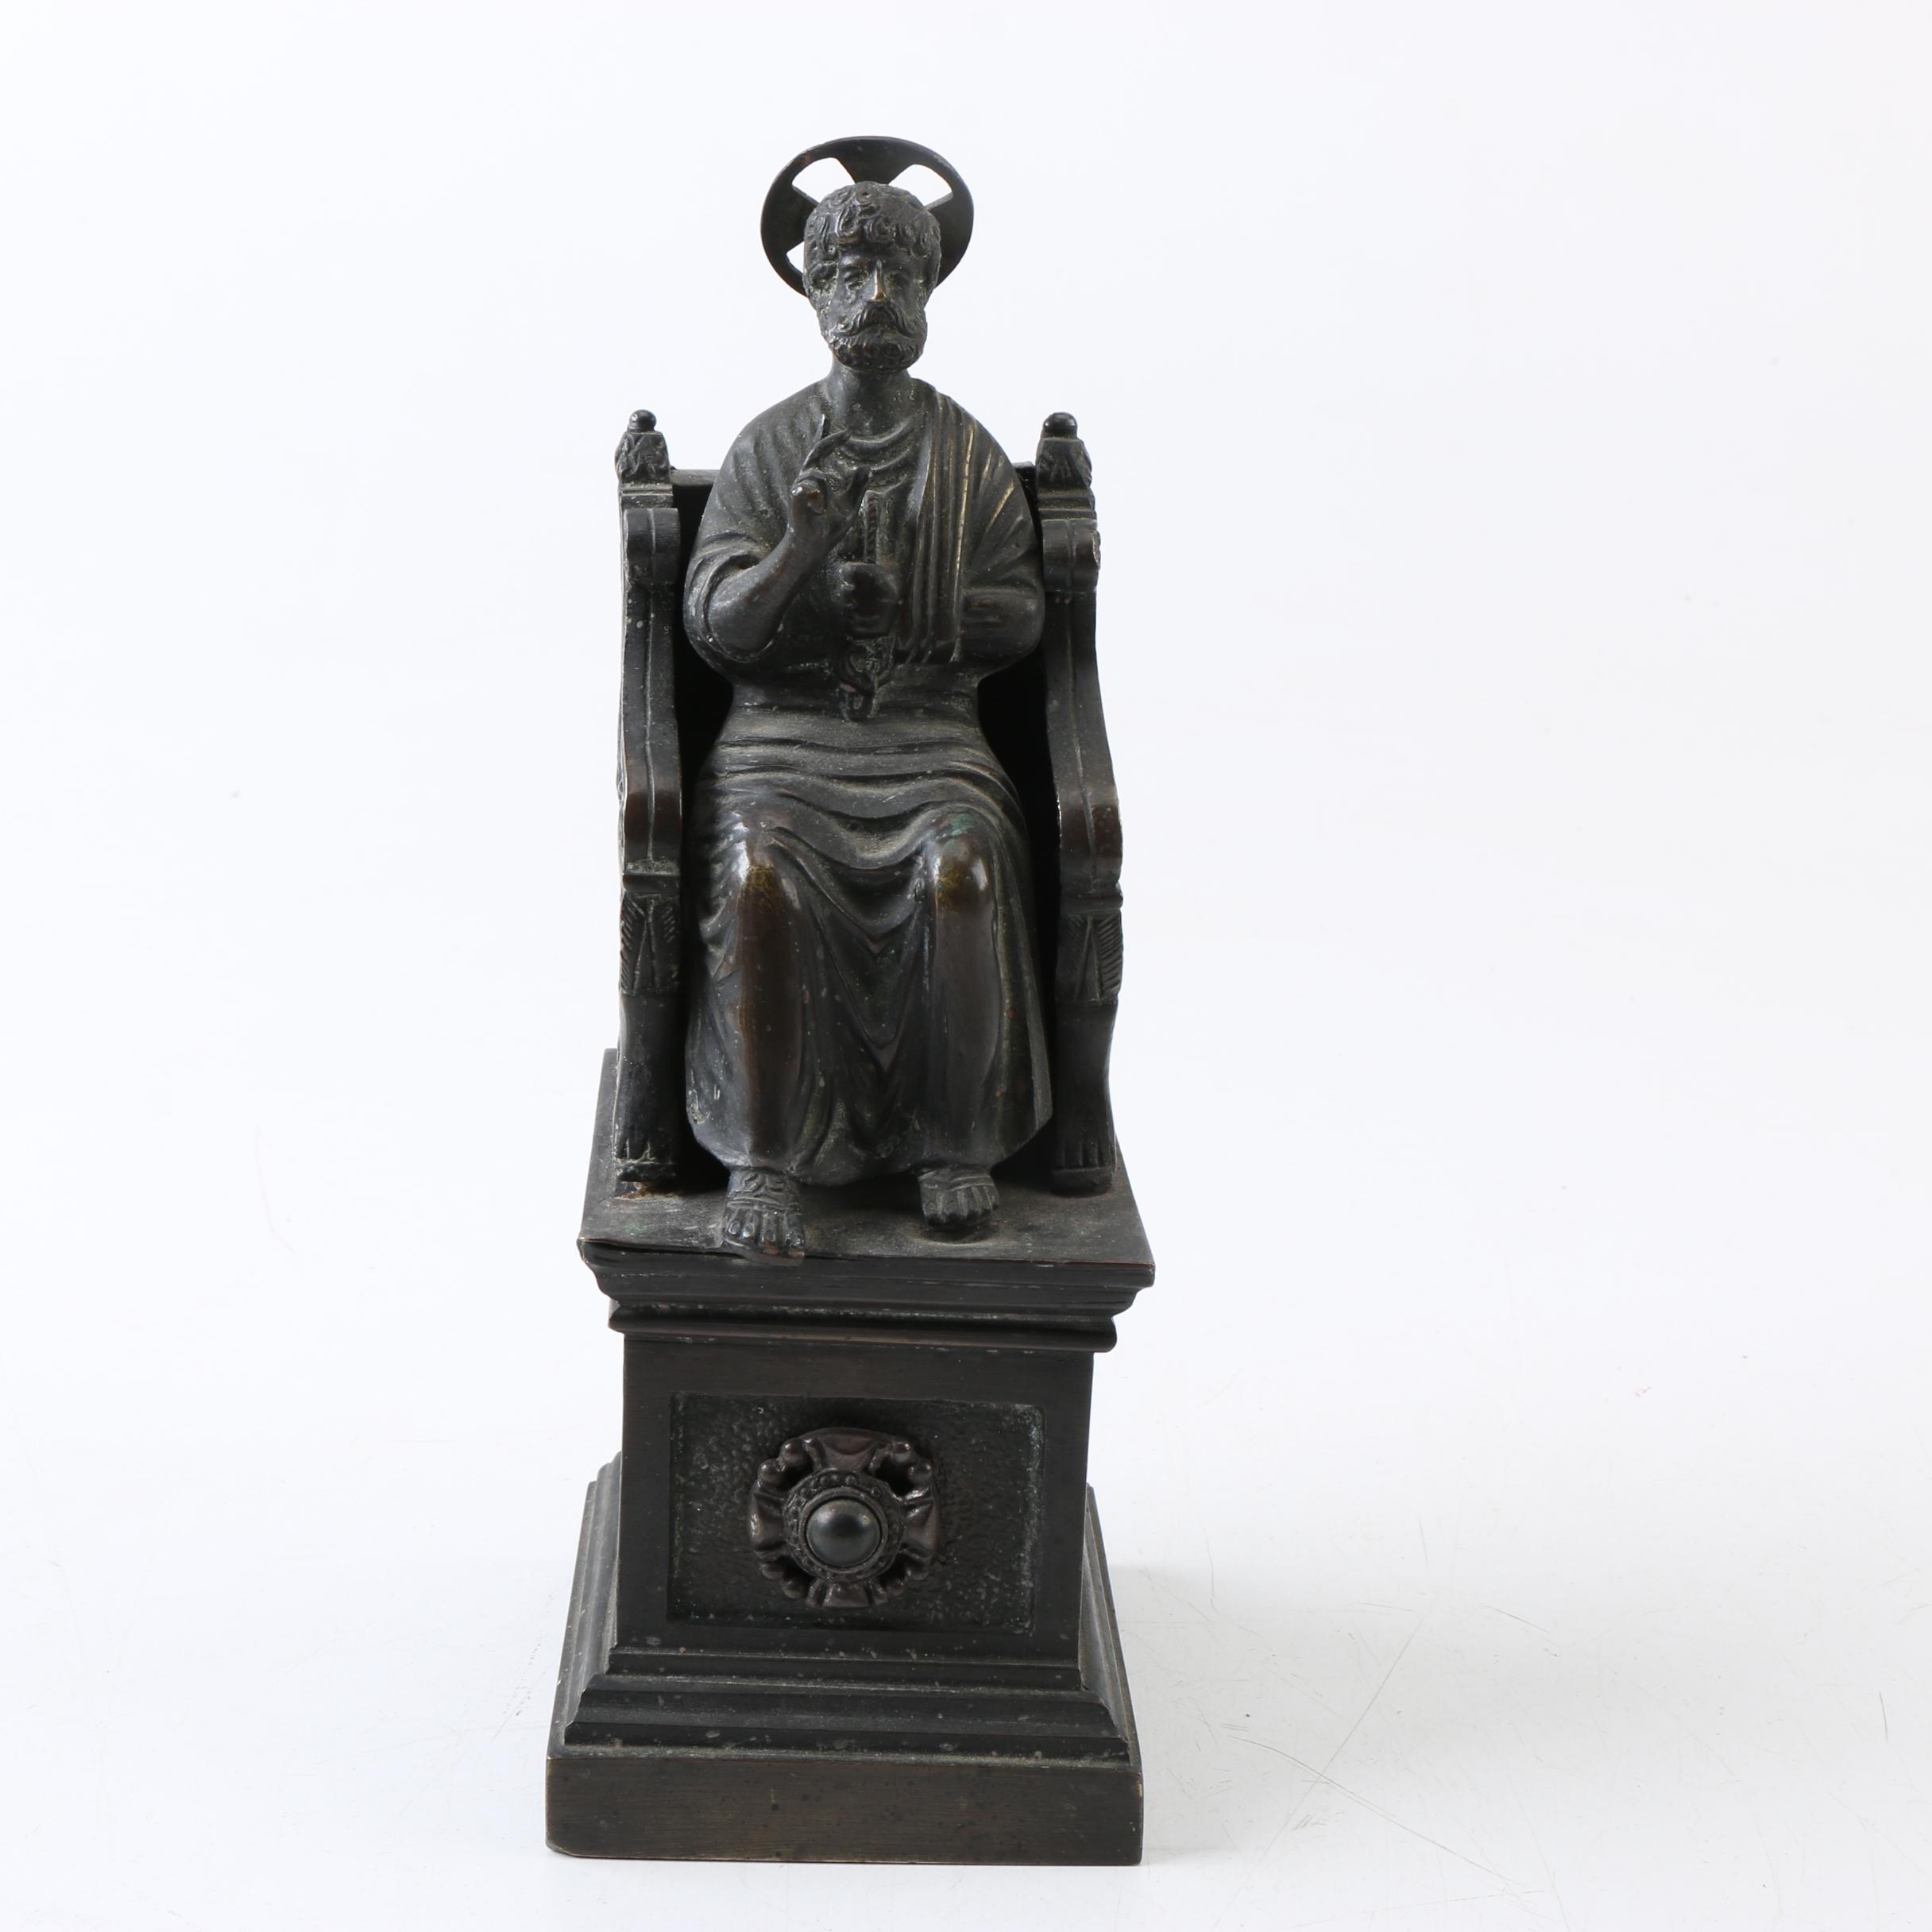 Brass Reproduction Sculpture of Saint Peter